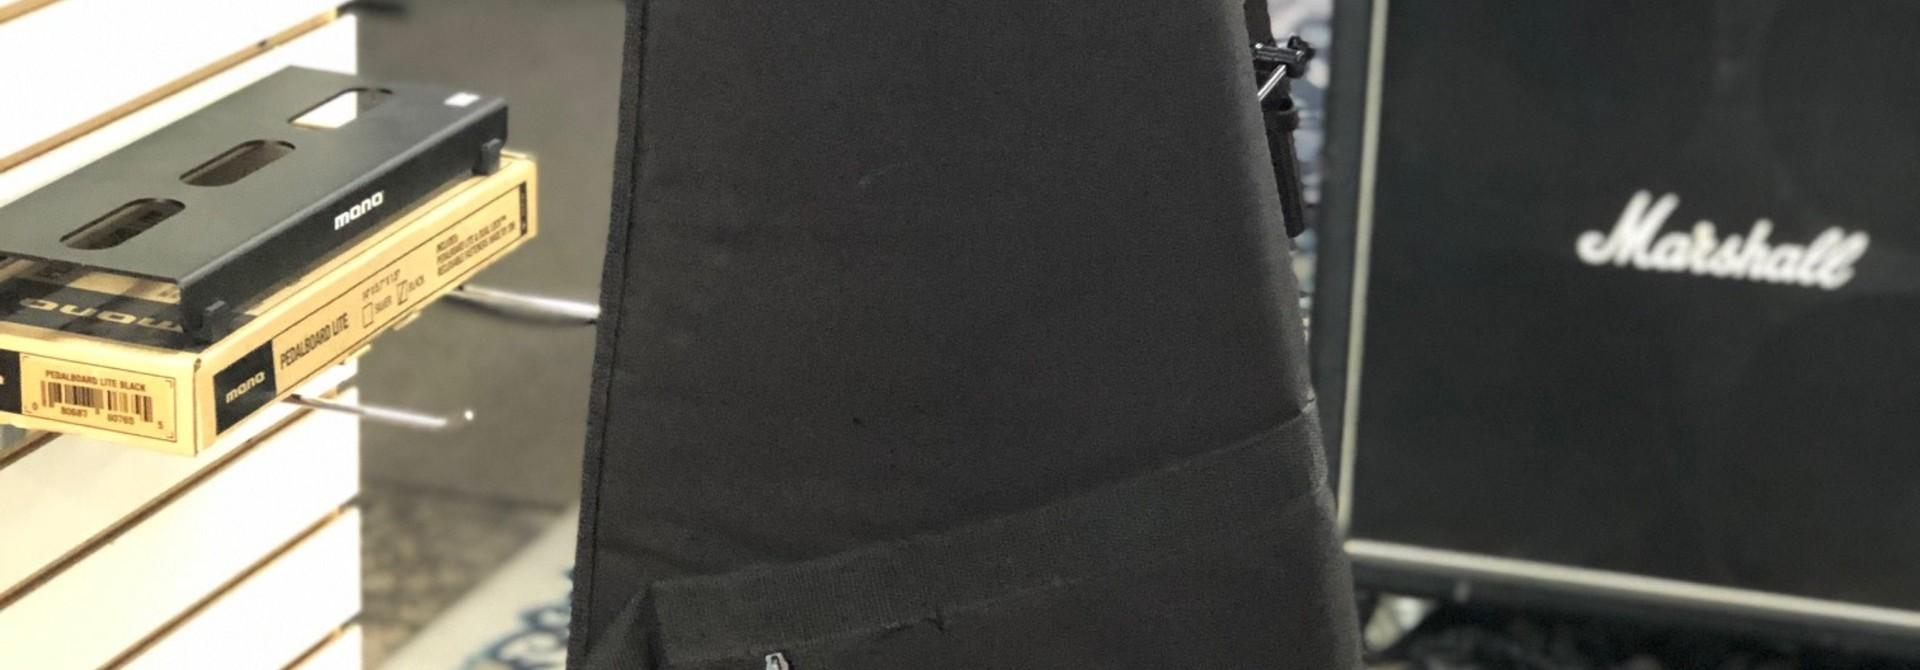 Gibson Padded Gig Bag Black/Grey interior